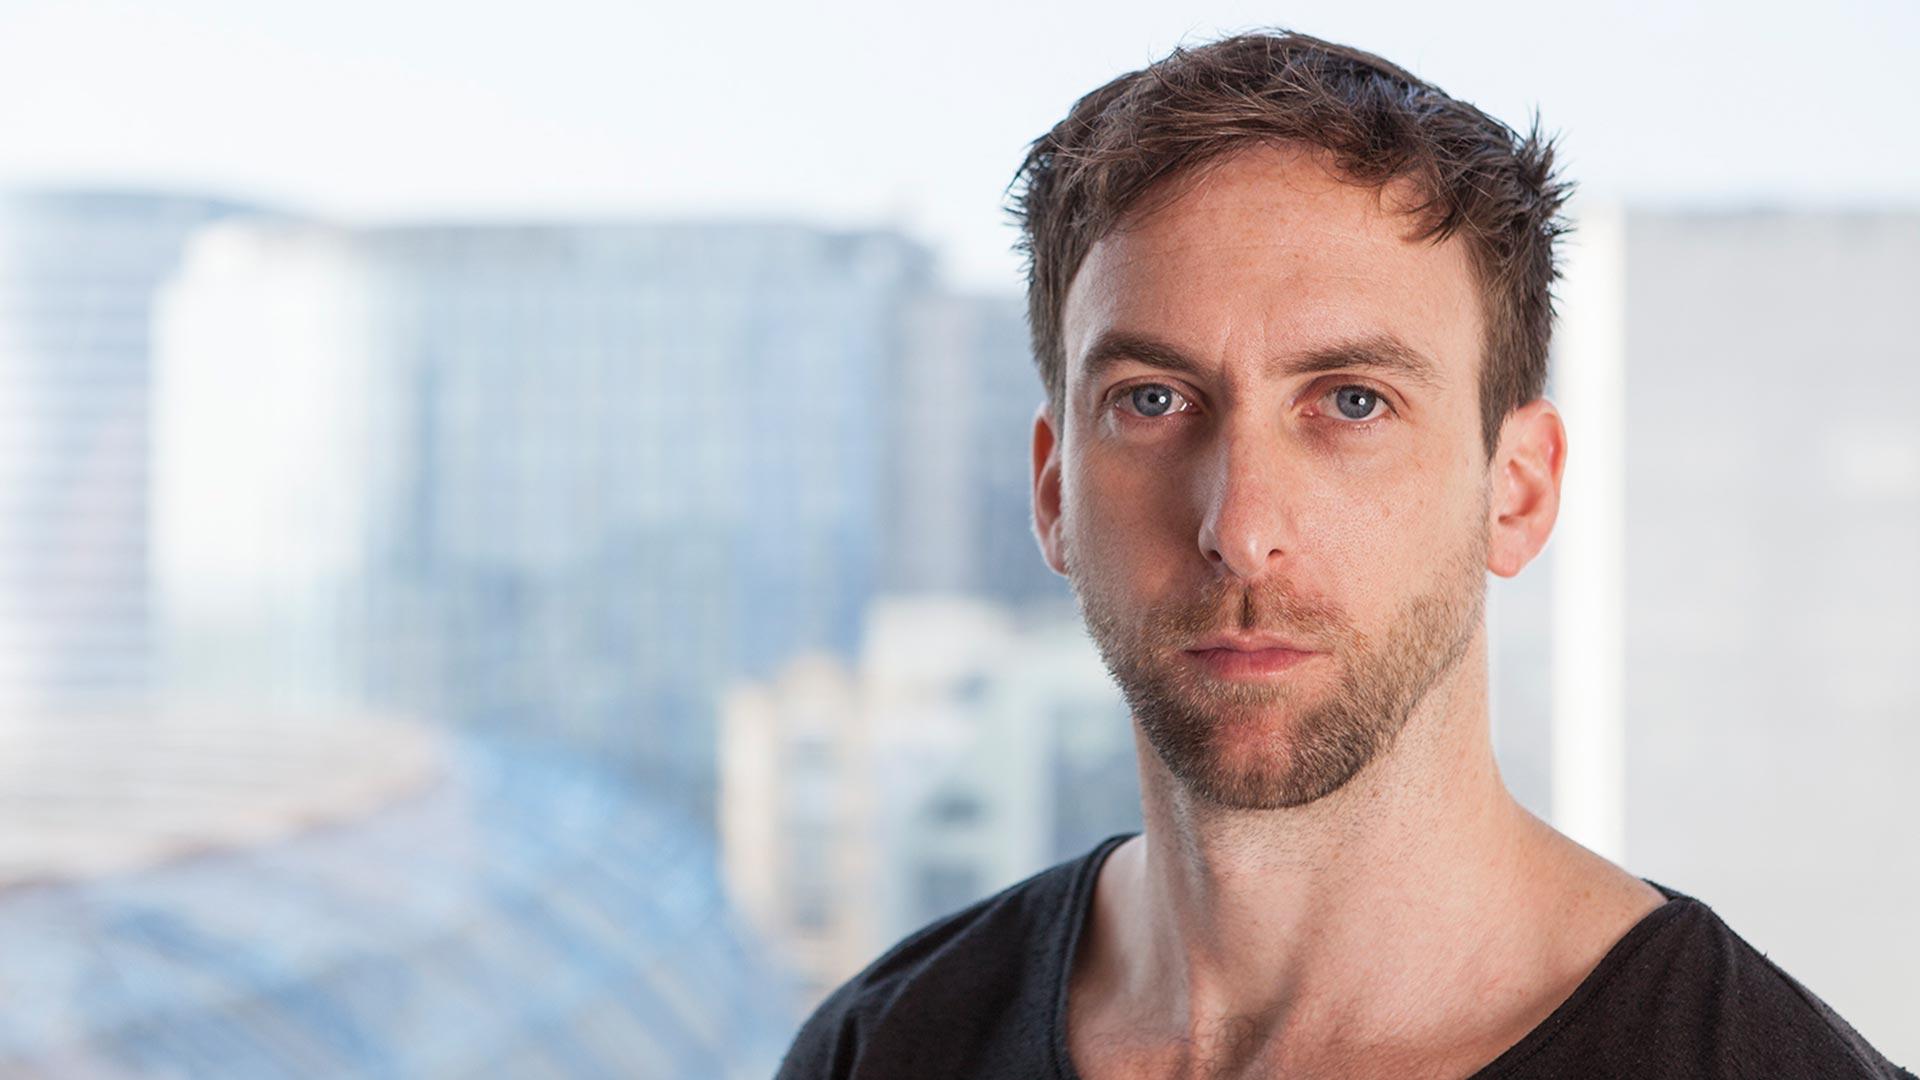 Daniel Blaker